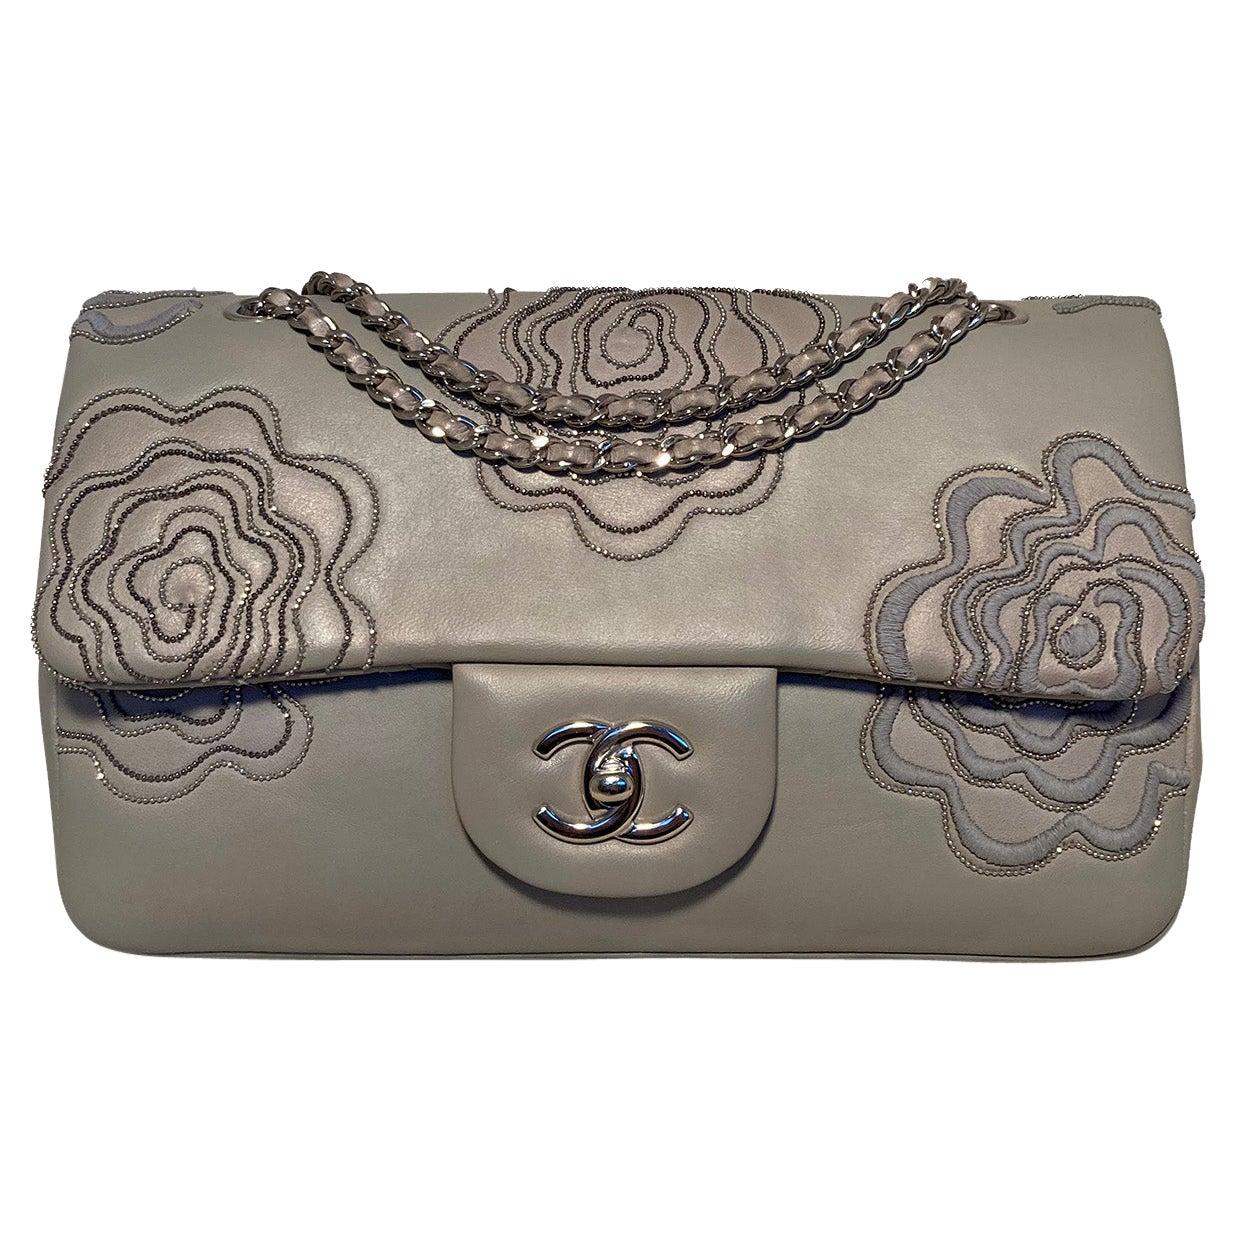 Chanel Camellia Follies Embroidered Medium Classic Flap